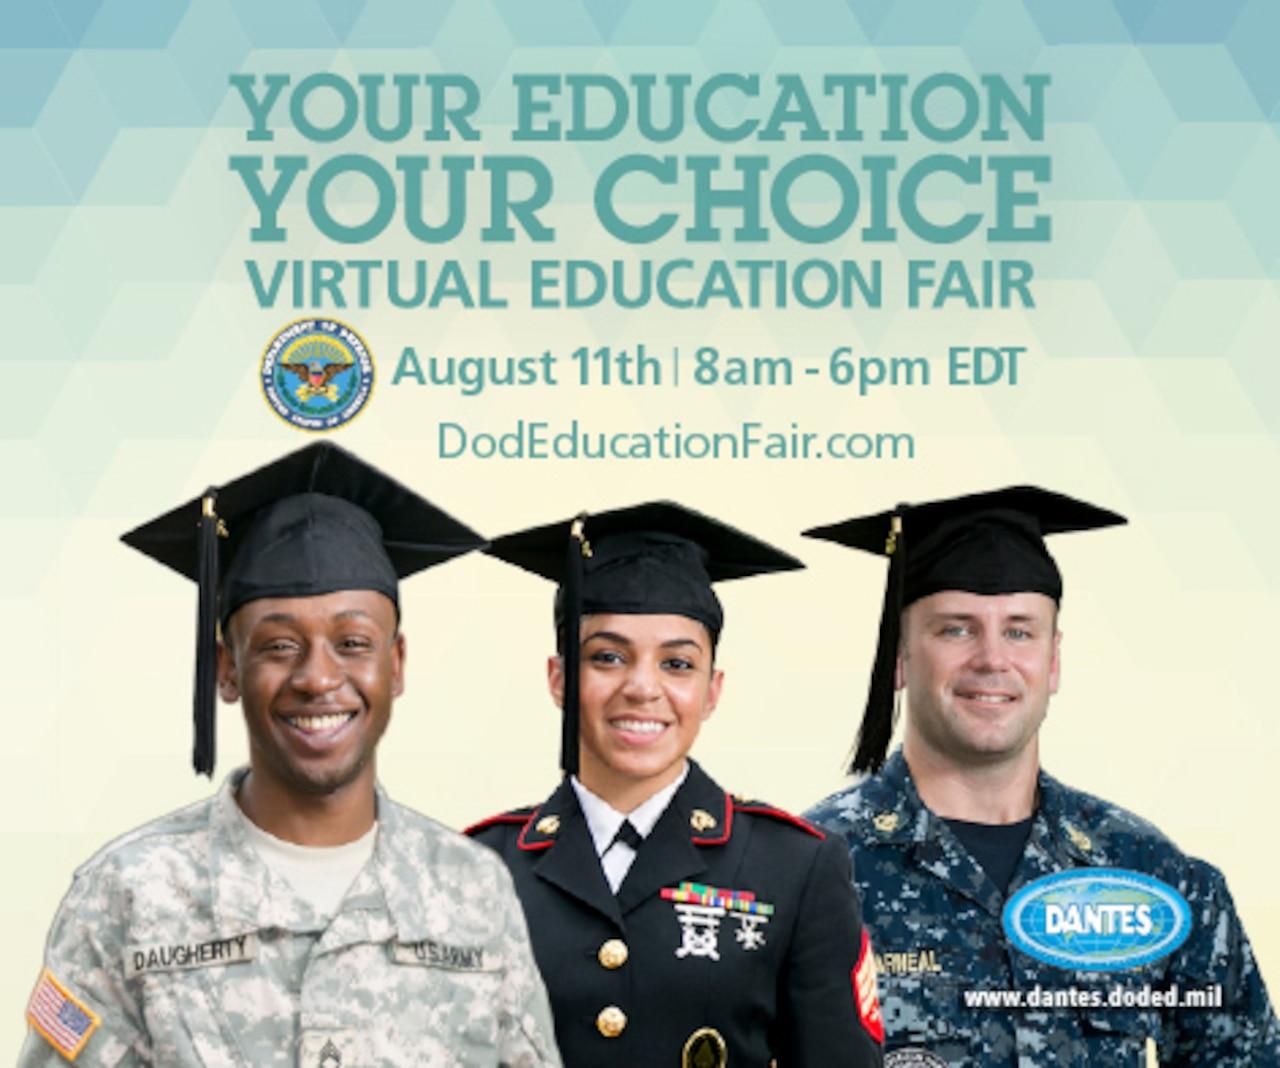 DANTES Virtual Education Fair promo graphic